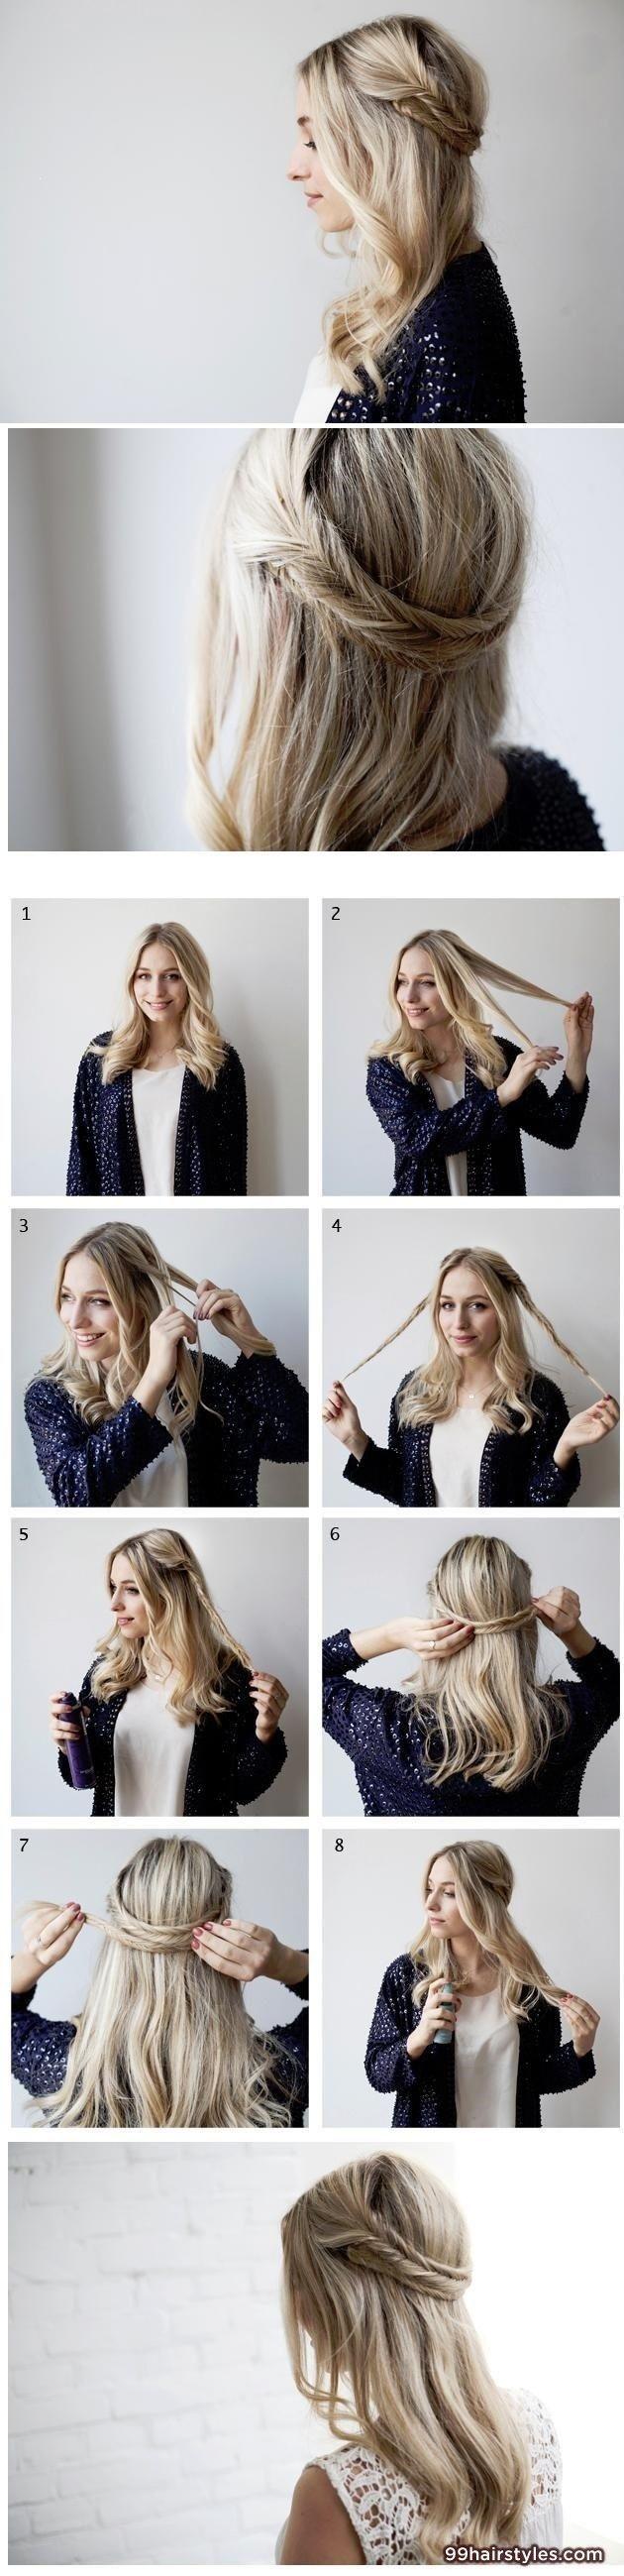 hairstyle tutorial - 99 Hairstyles Ideas